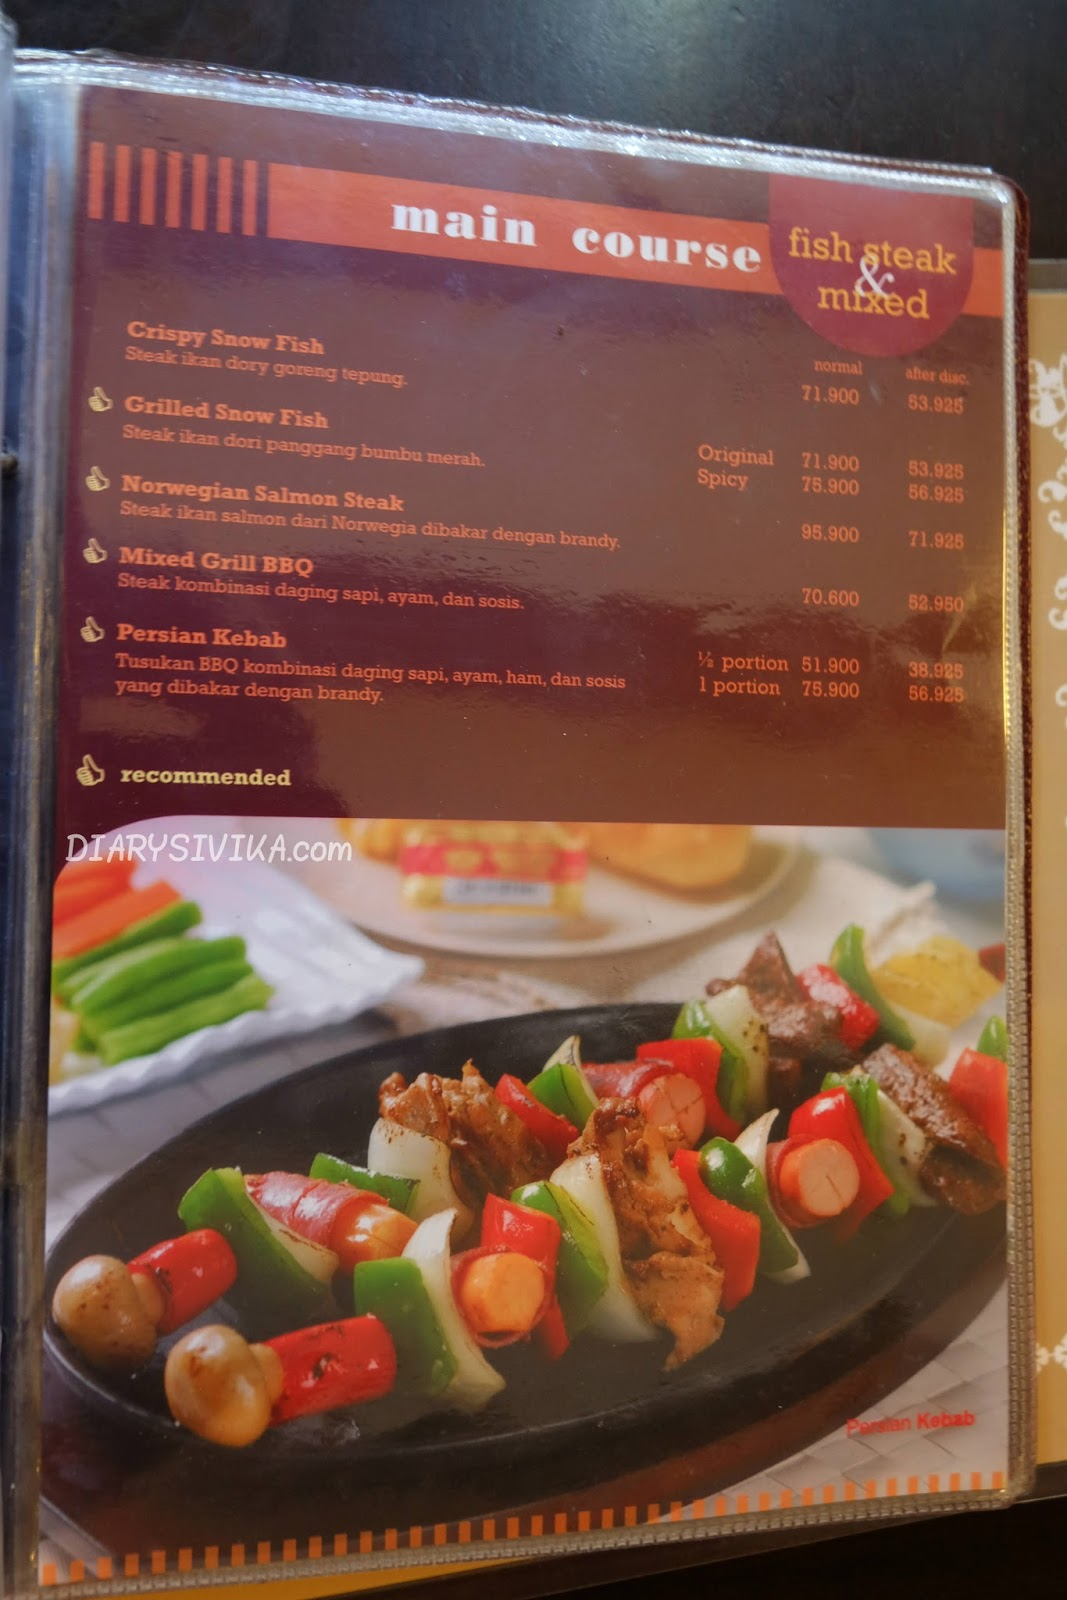 Steak Hut Surabaya  DiarySivika  Food Travel and